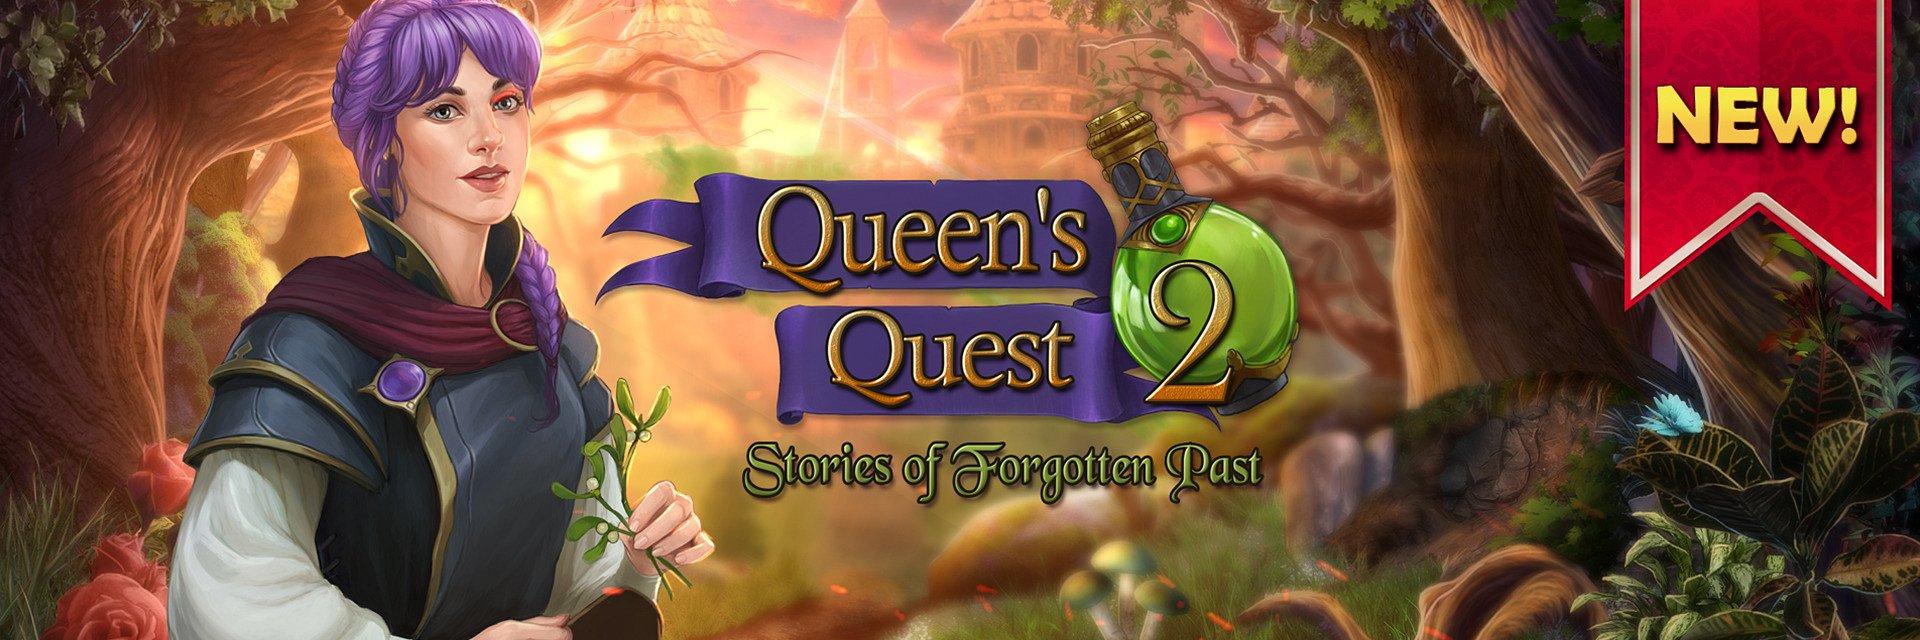 Queen's Quest 2 arrives on consoles!